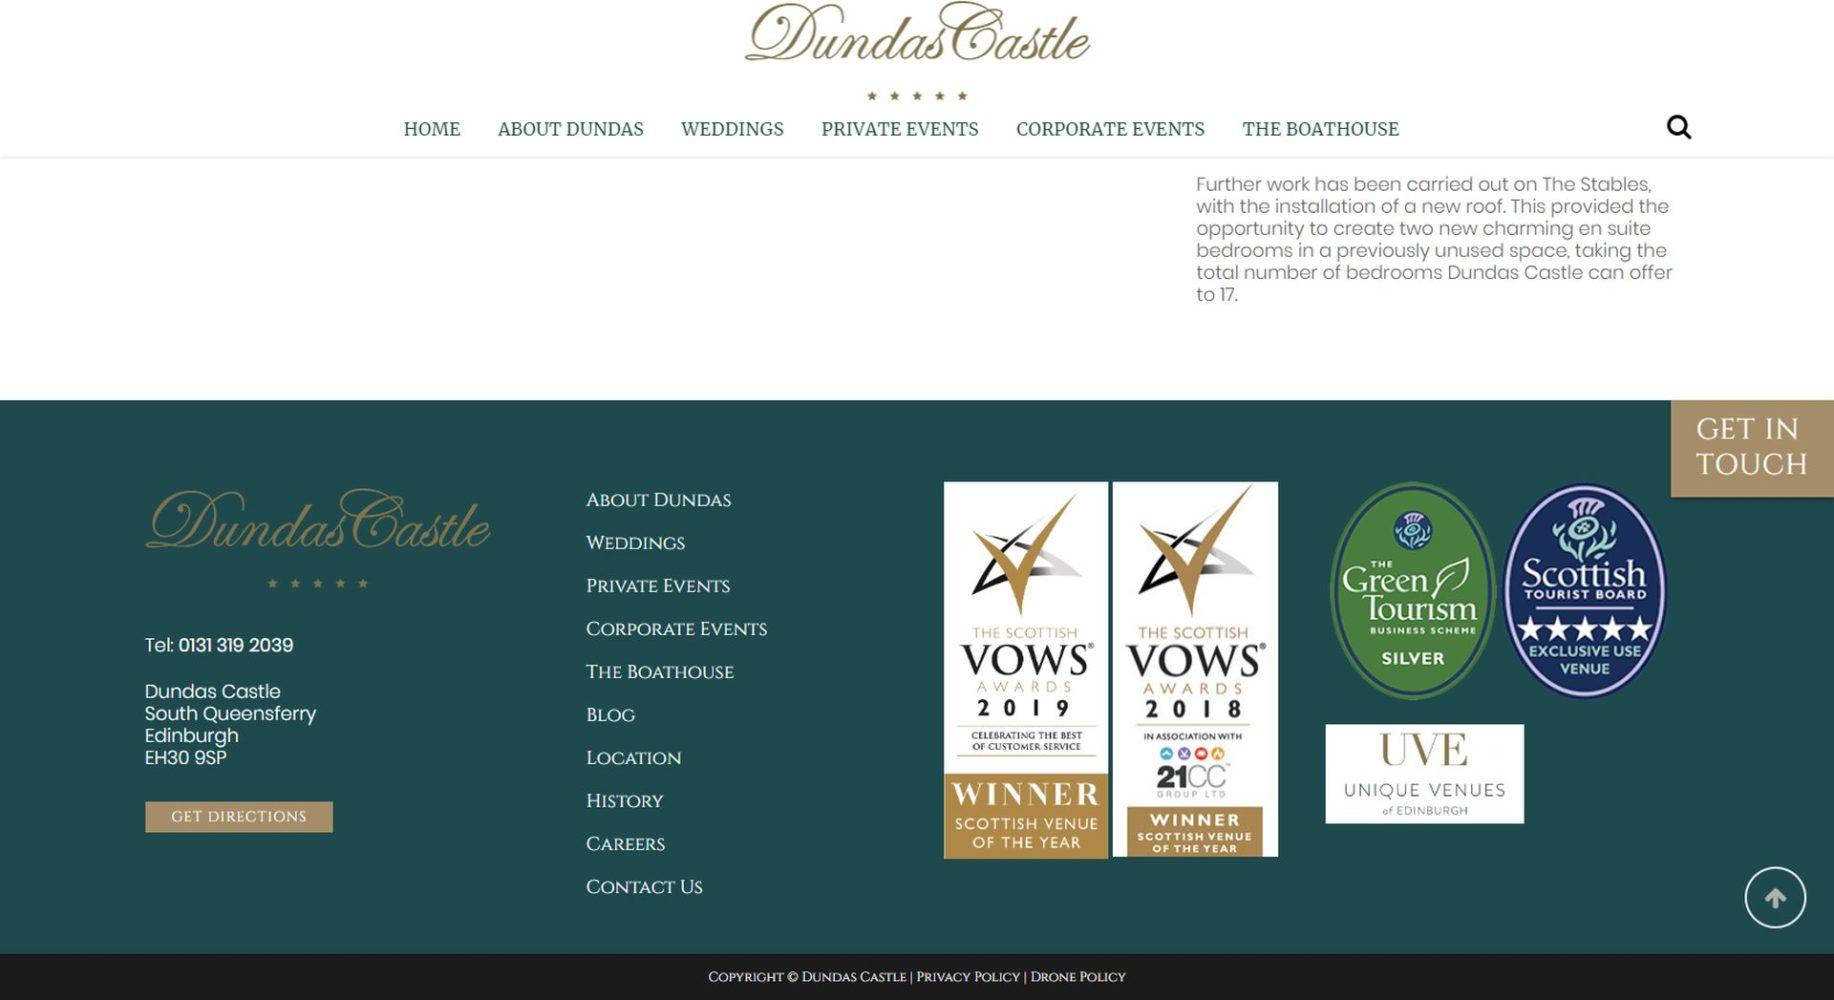 Dundas Castle Website Design Footer